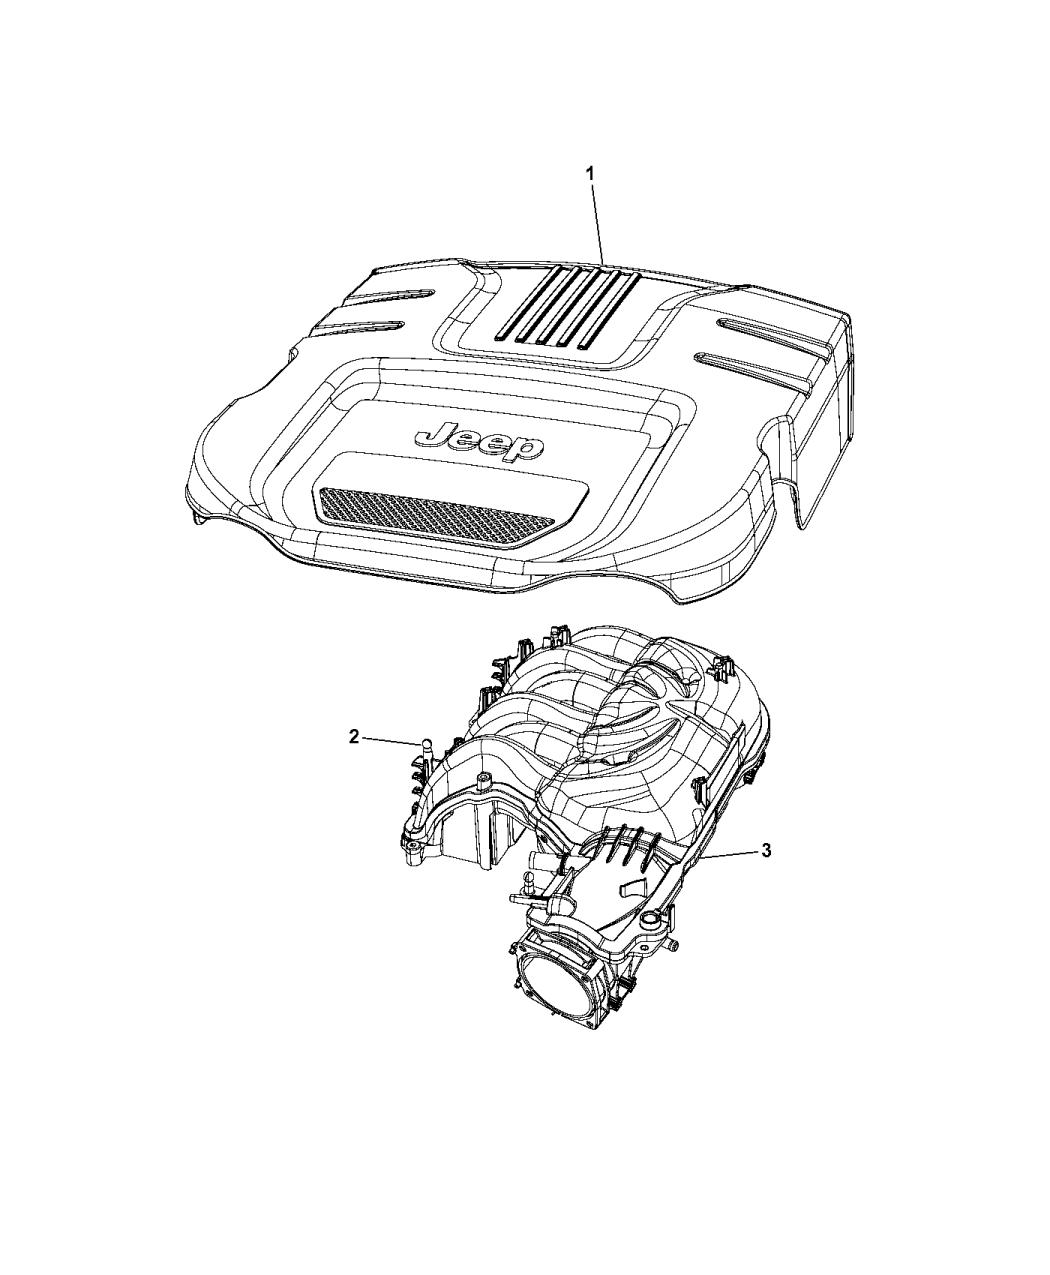 2014 jeep wrangler engine cover &